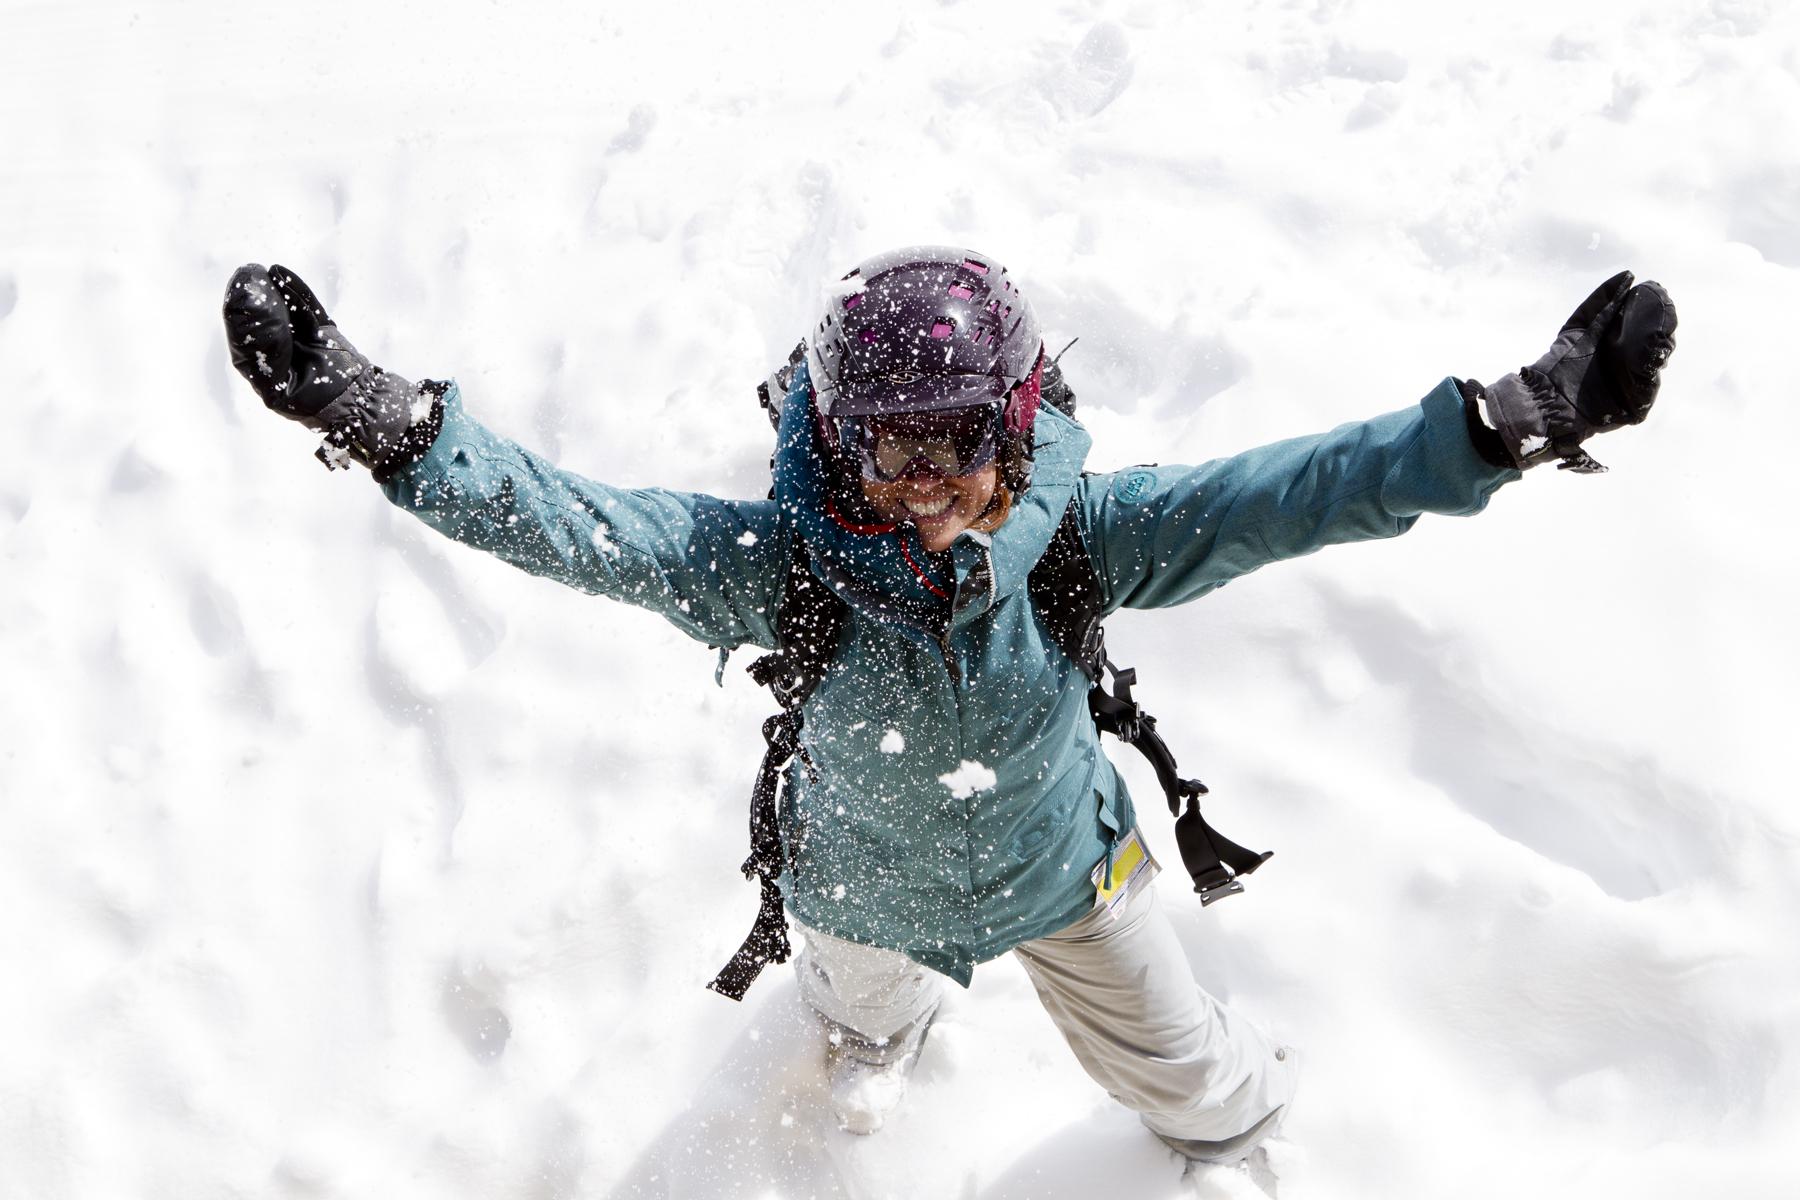 Regel via Wintersportcanadamerika een 11 weekse ski of snowboardopleiding in Banff en haal je CSIA licentie